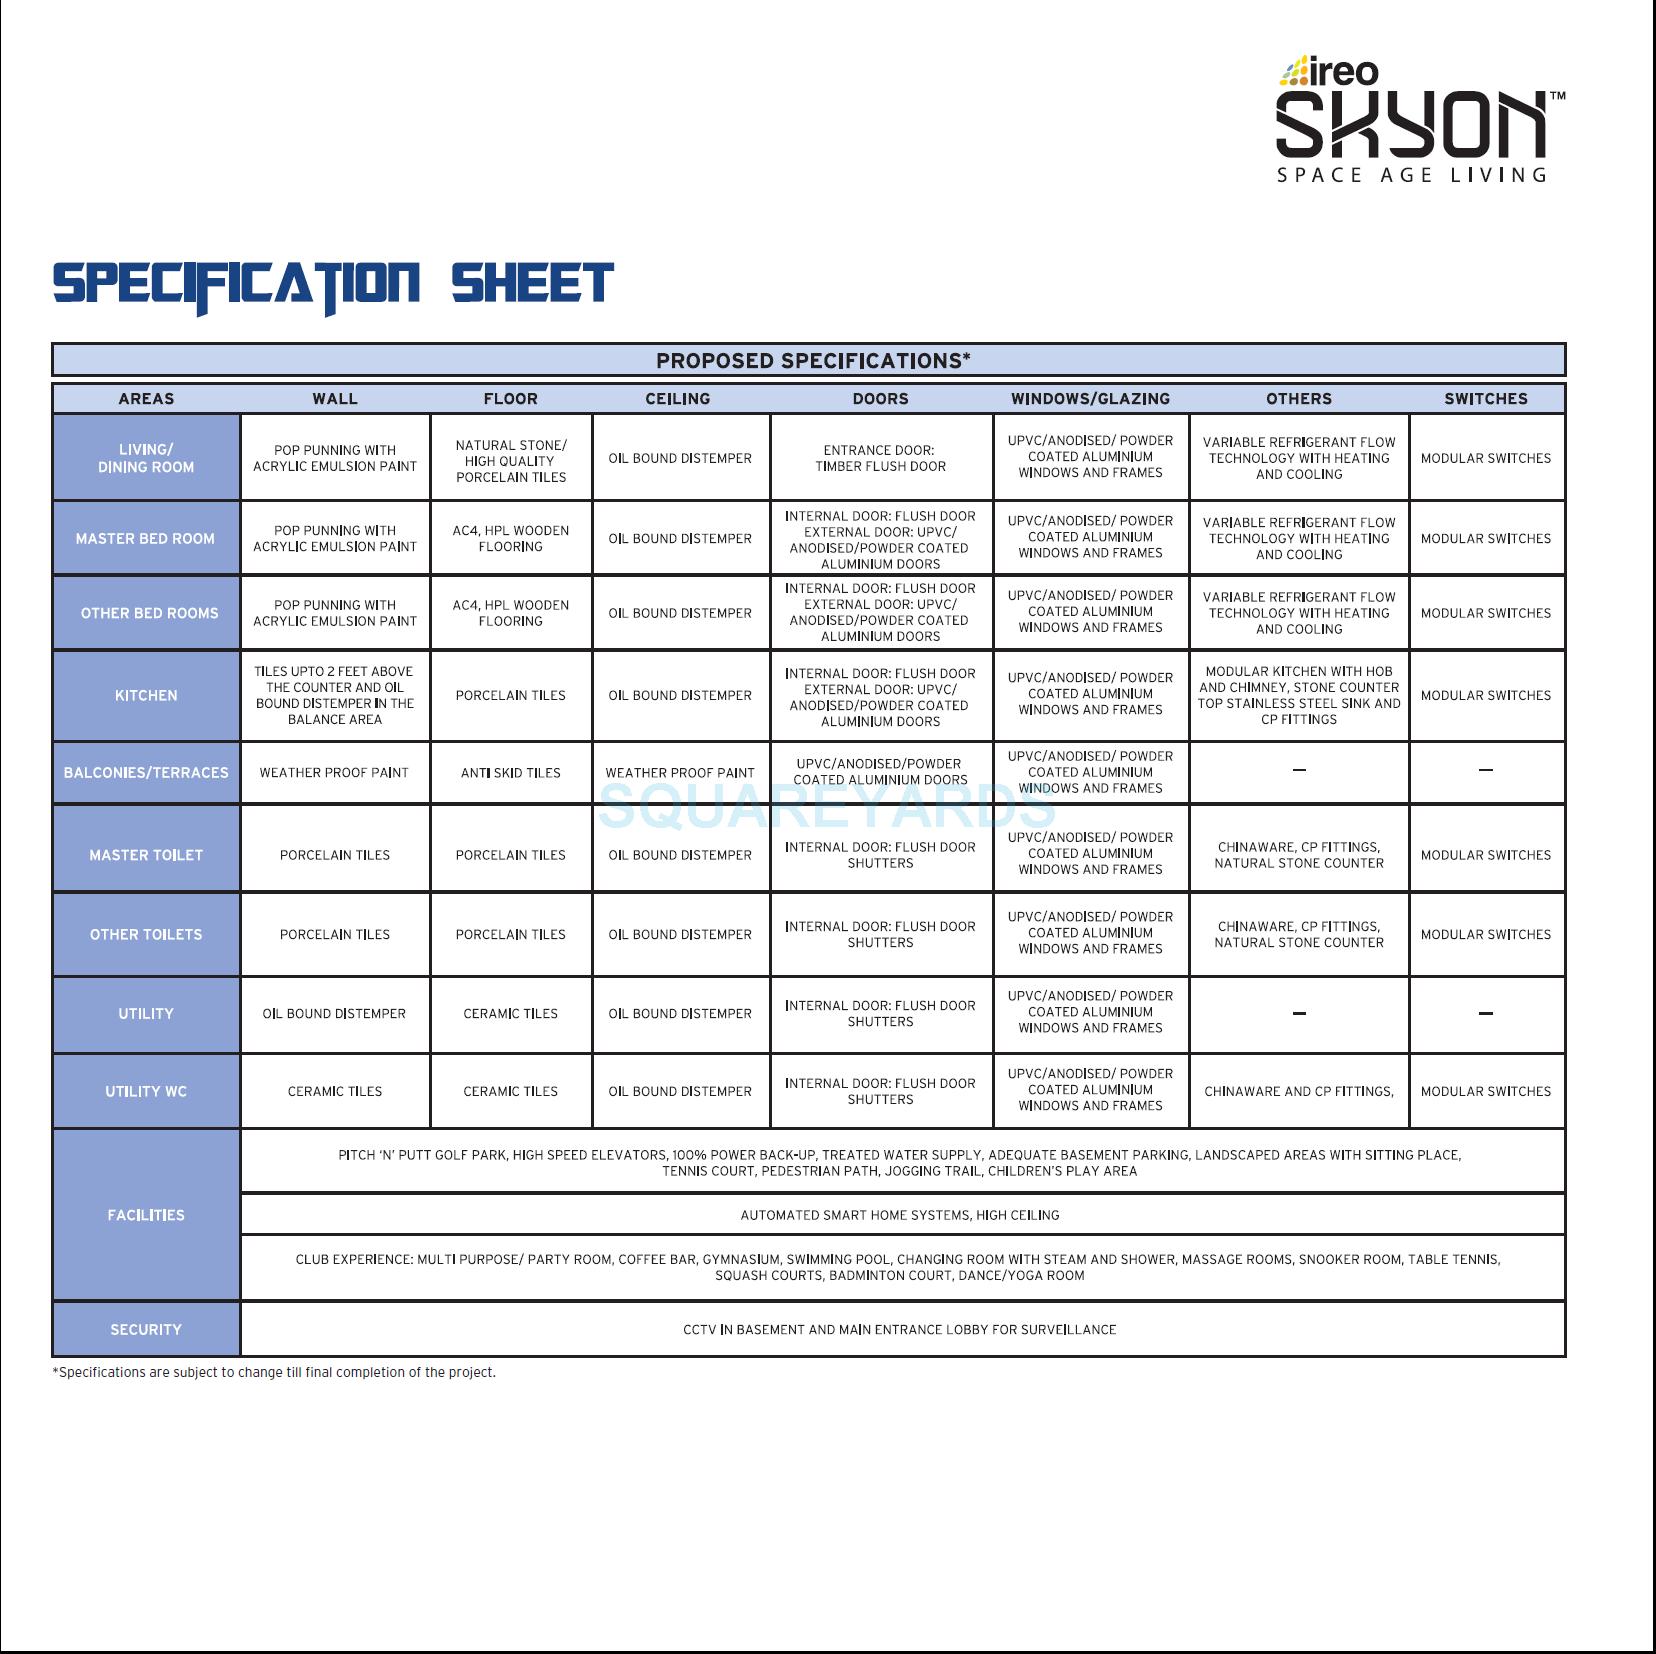 ireo skyon specification1